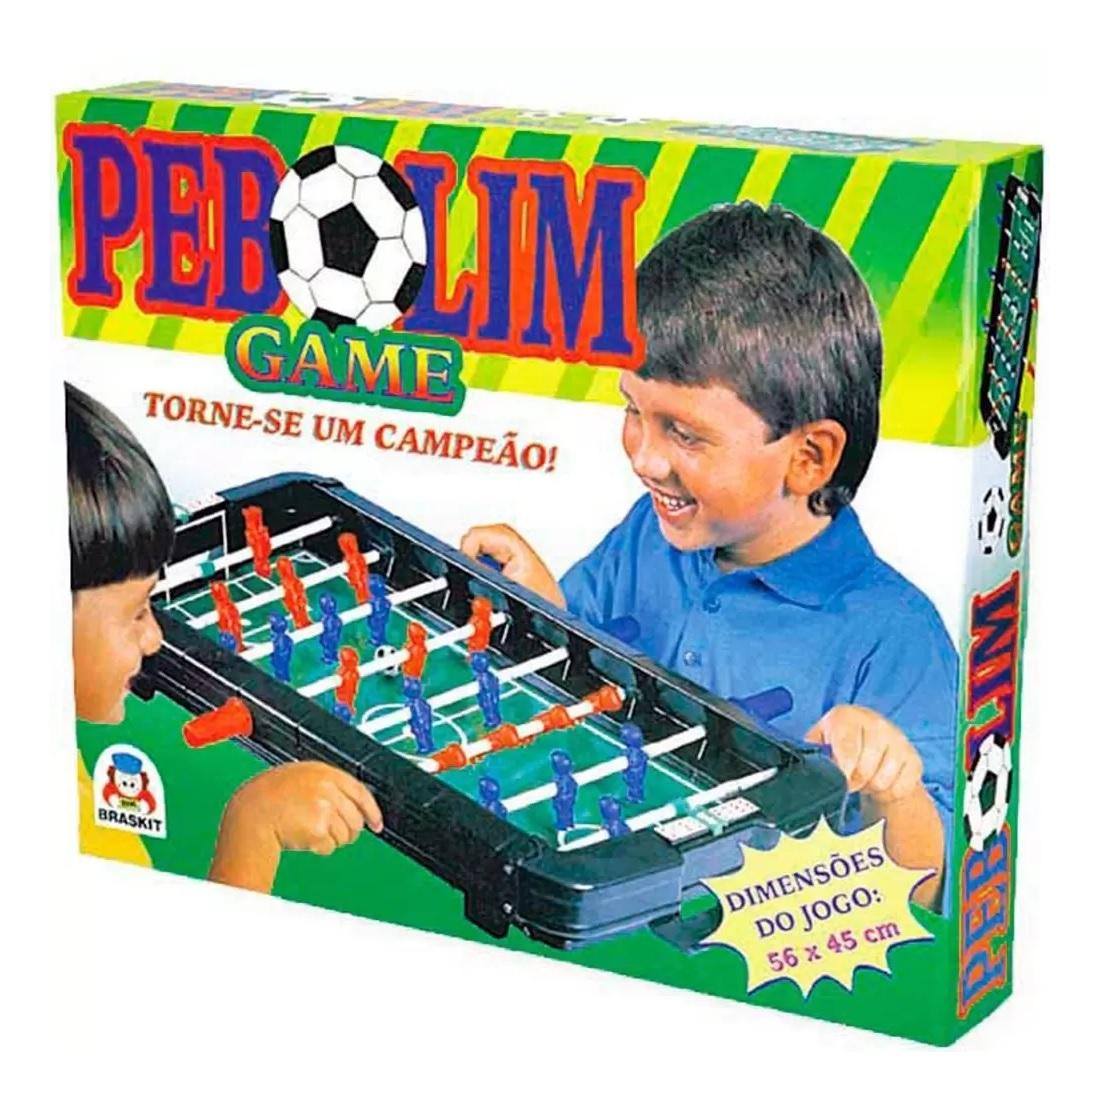 Jogo Pebolim Game - Braskit